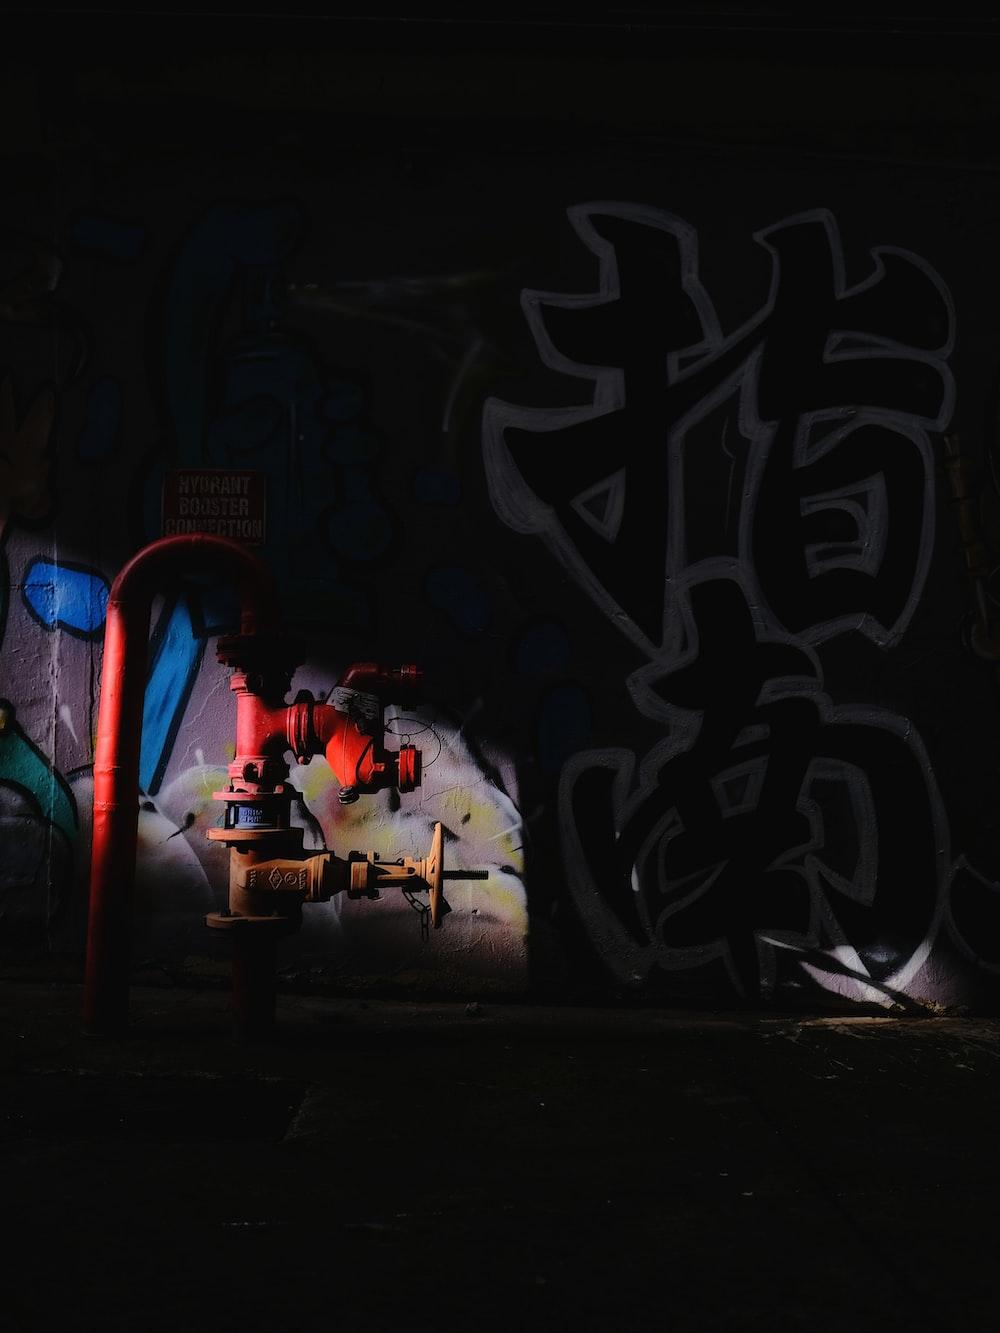 kanji mural